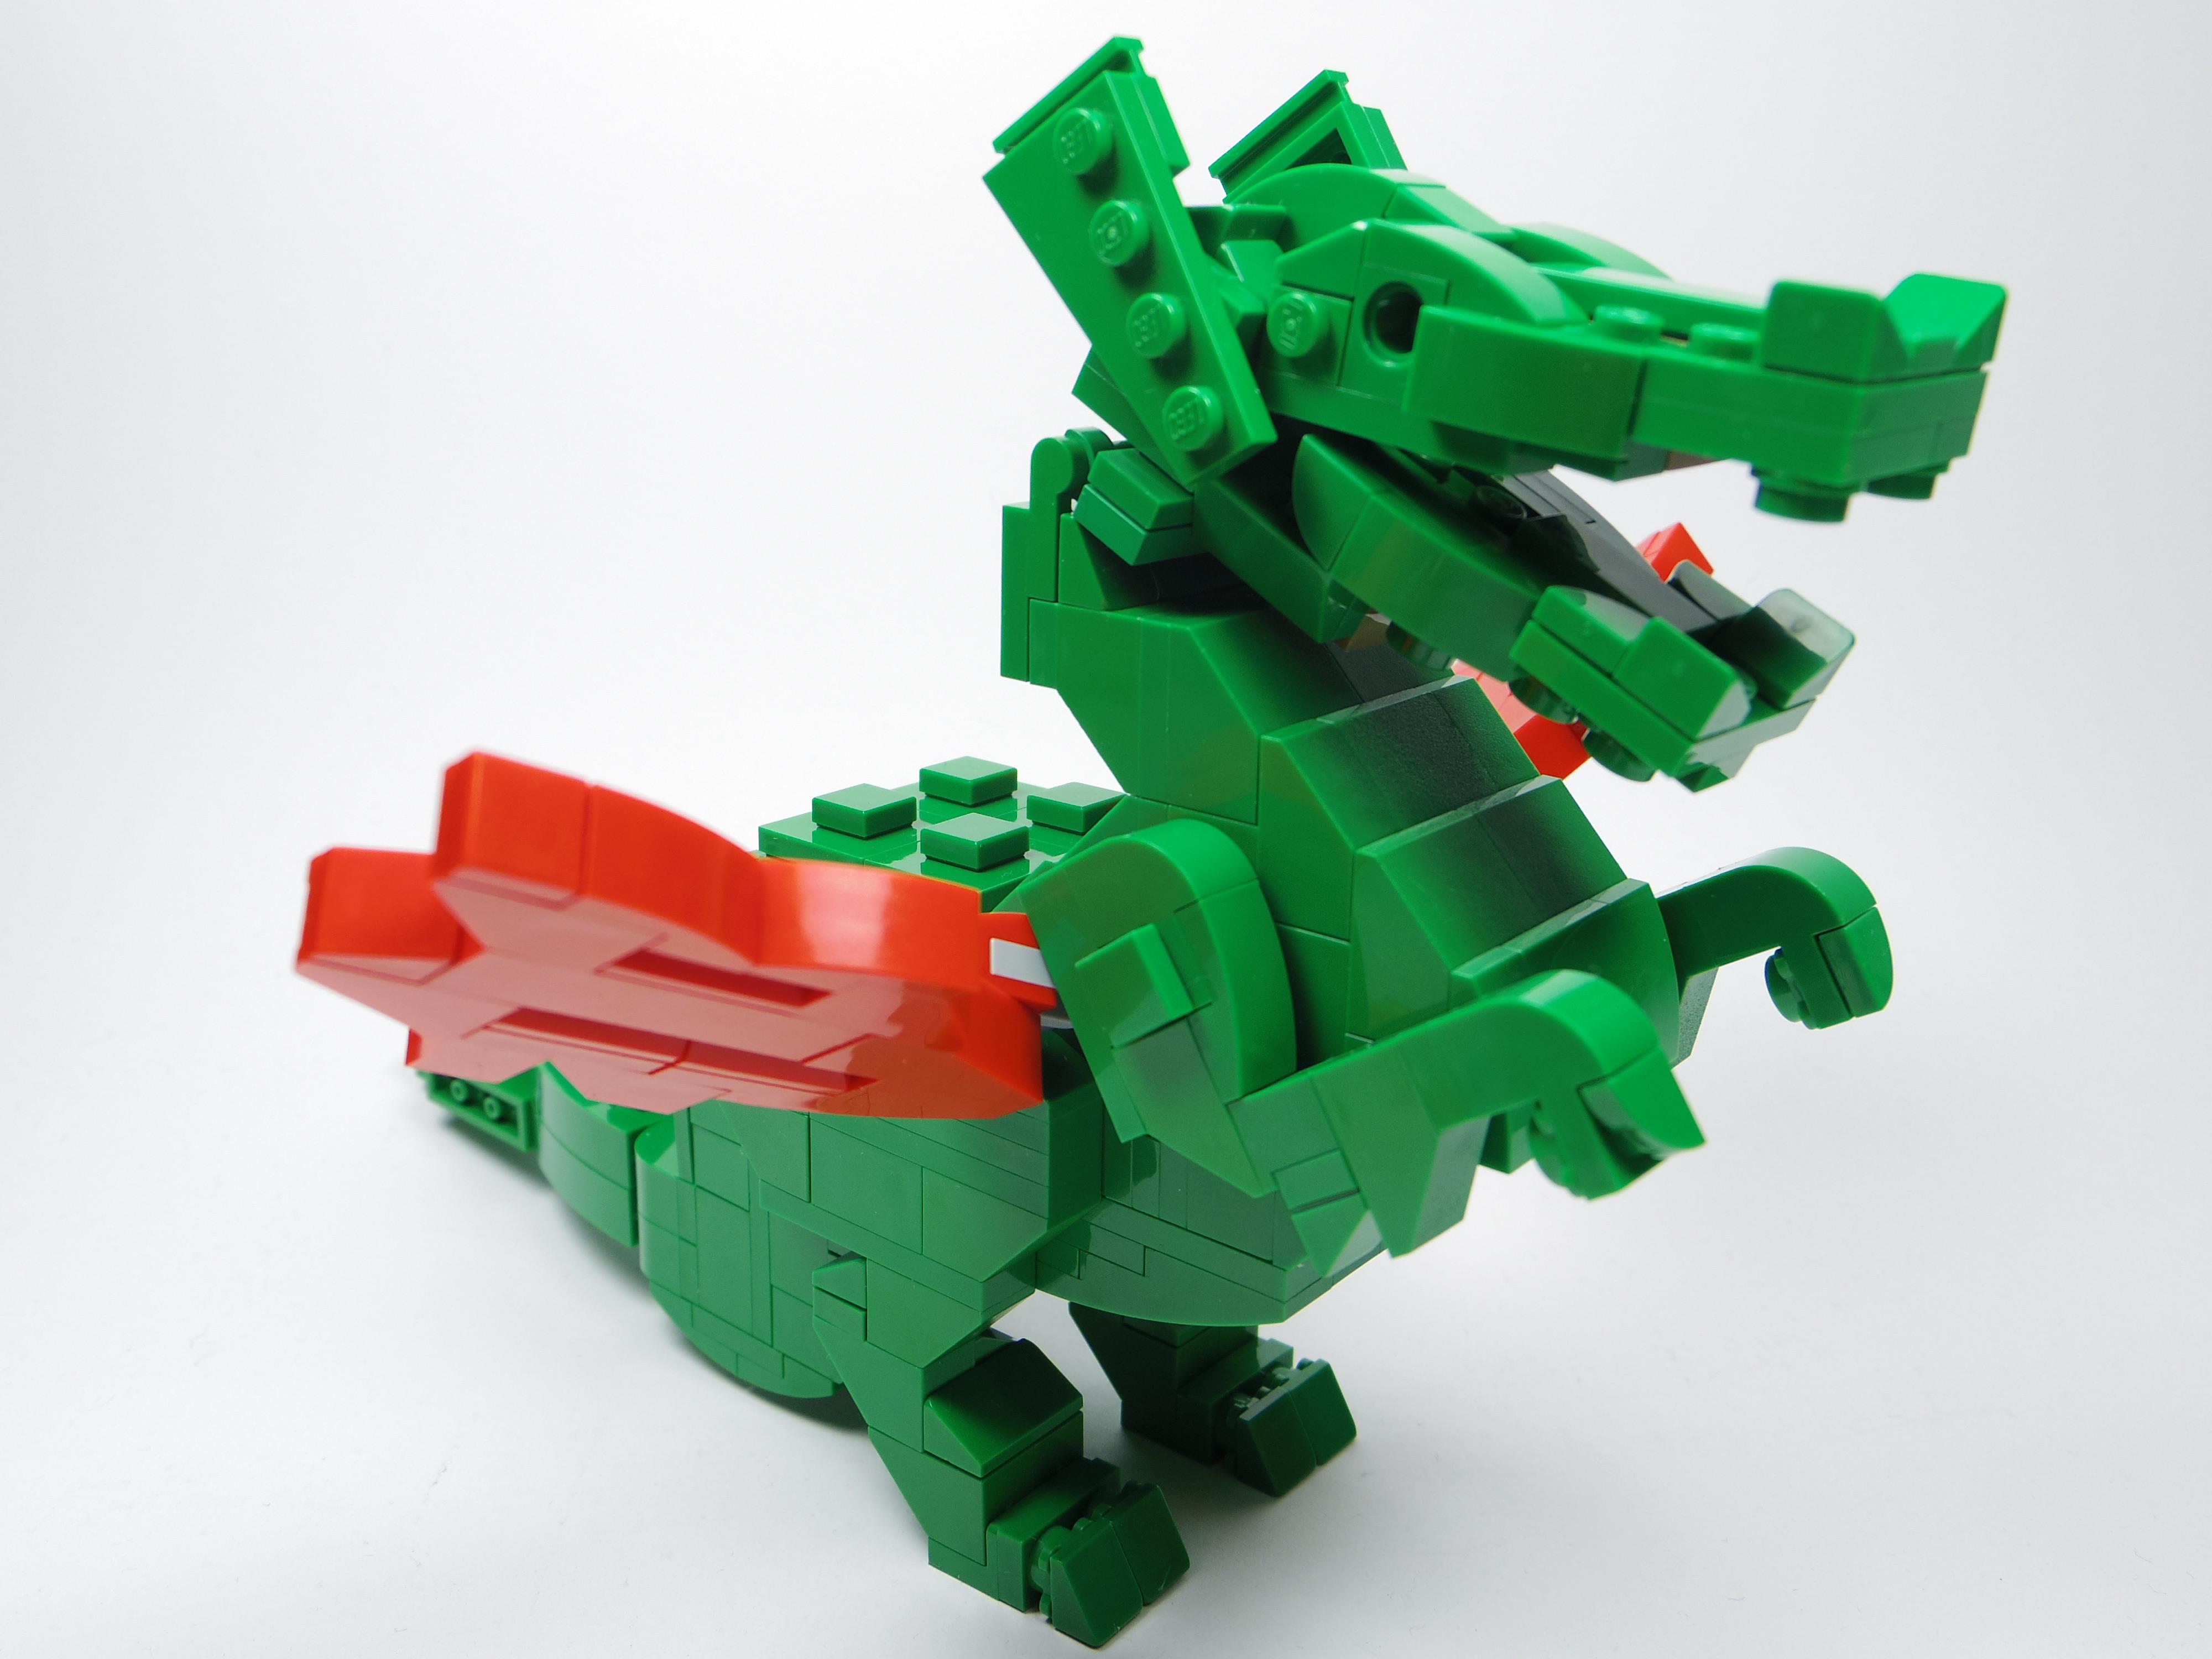 [查米]樂高經典動物-綠龍Green Dragon with Red Wings